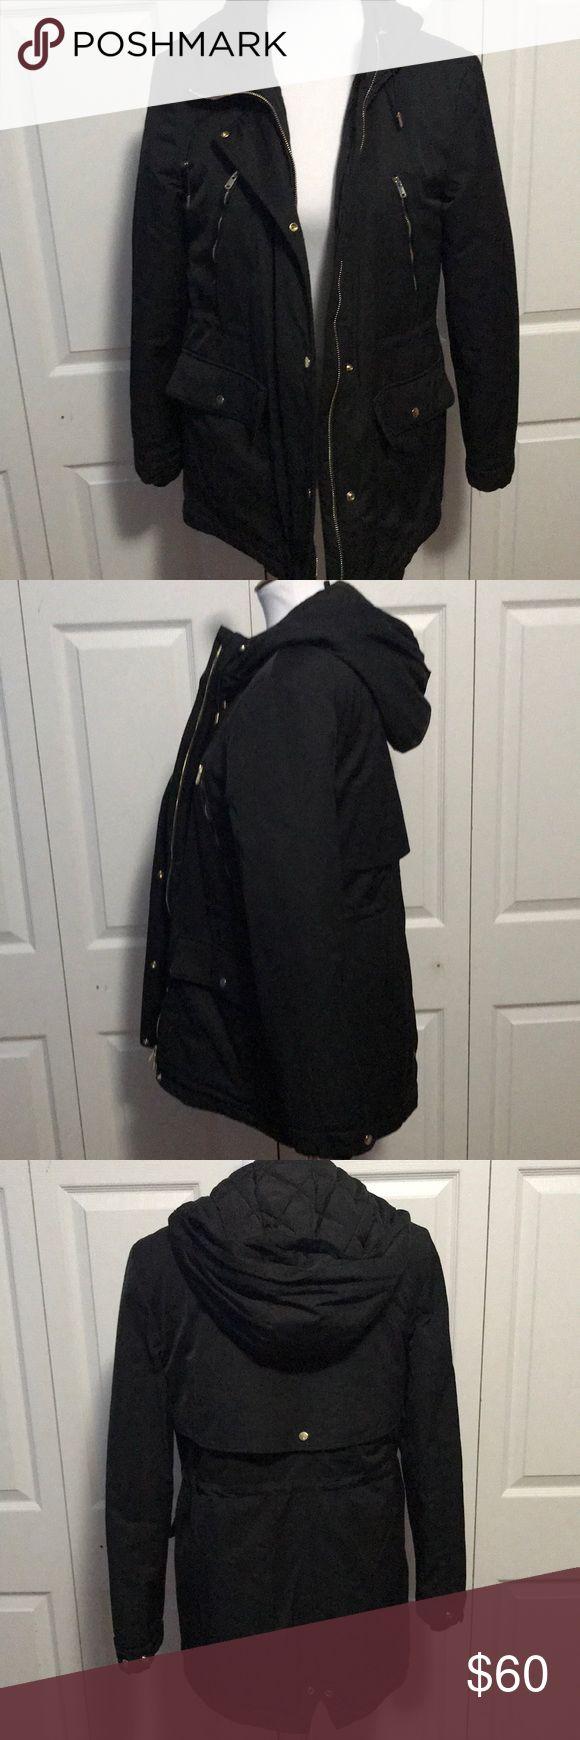 Zara Black parka  jacket Black jacket. Never worn. Excellent condition Zara Jackets & Coats